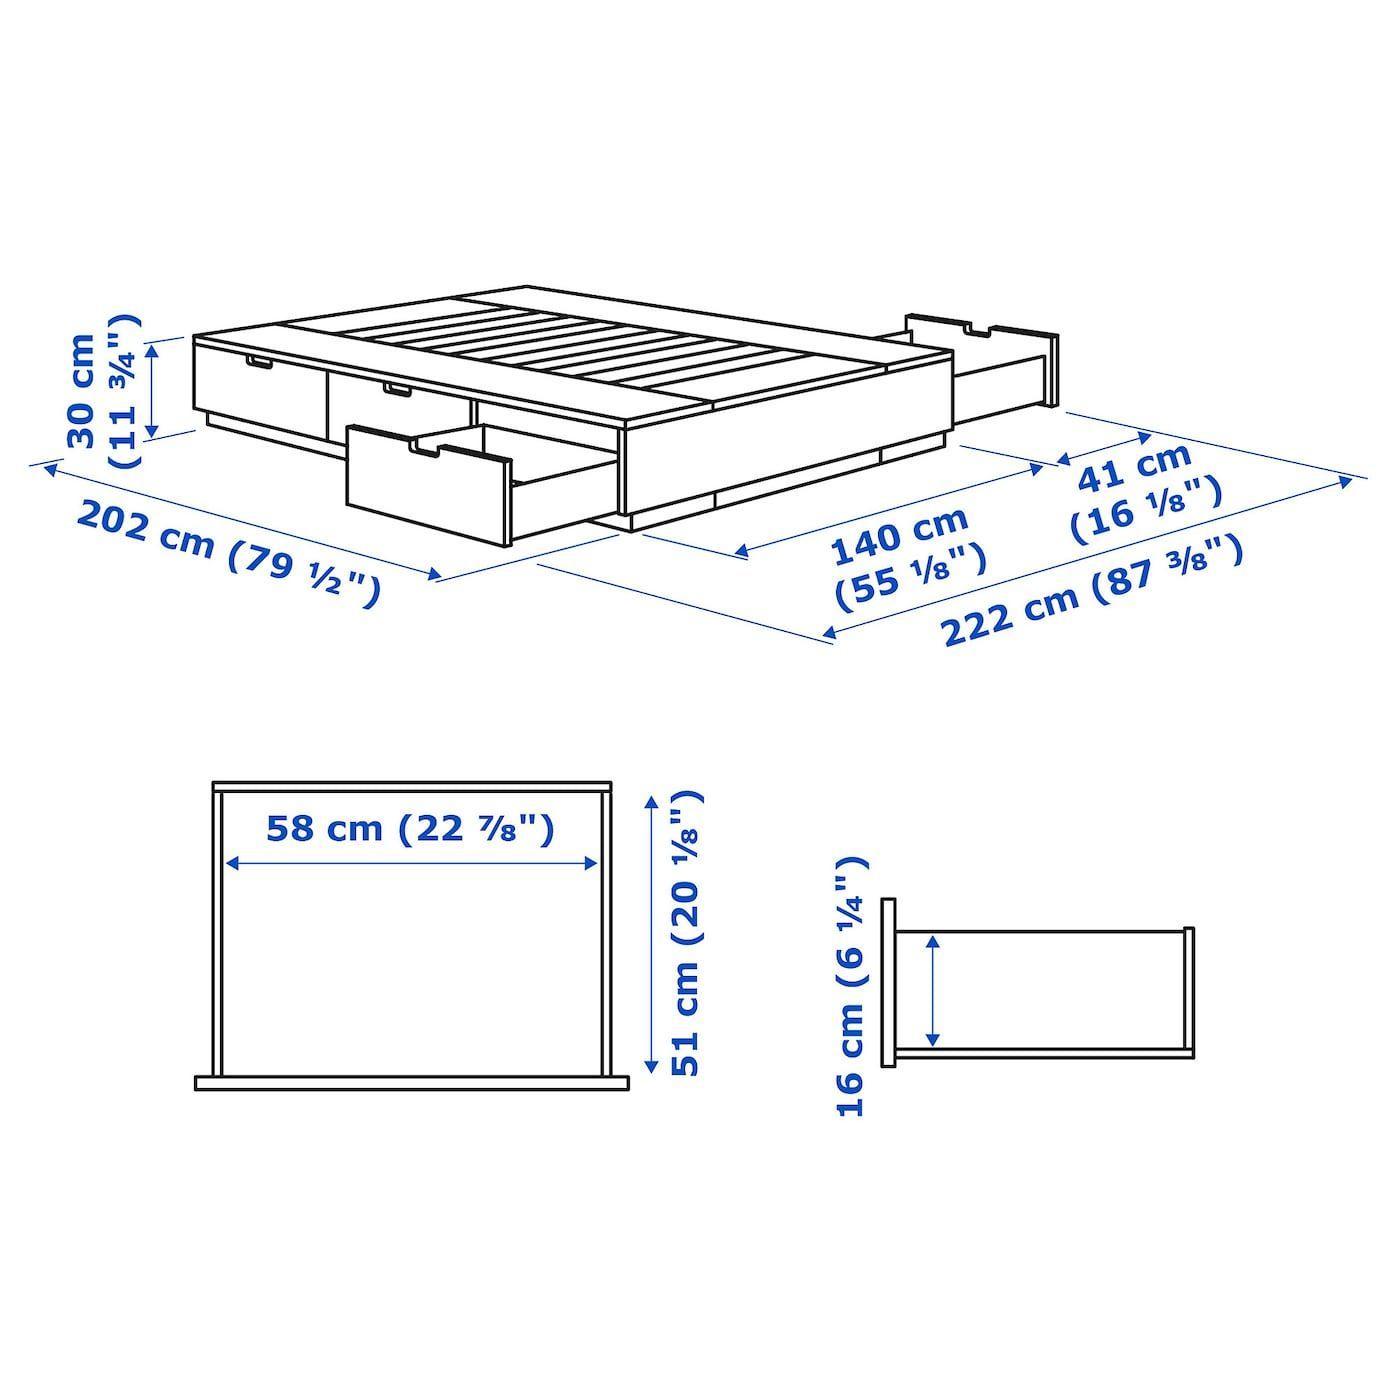 Nordli Struttura Letto Con Cassetti Bianco 140x200 Cm Ikea It In 2020 Bettgestell Schubladen Ikea